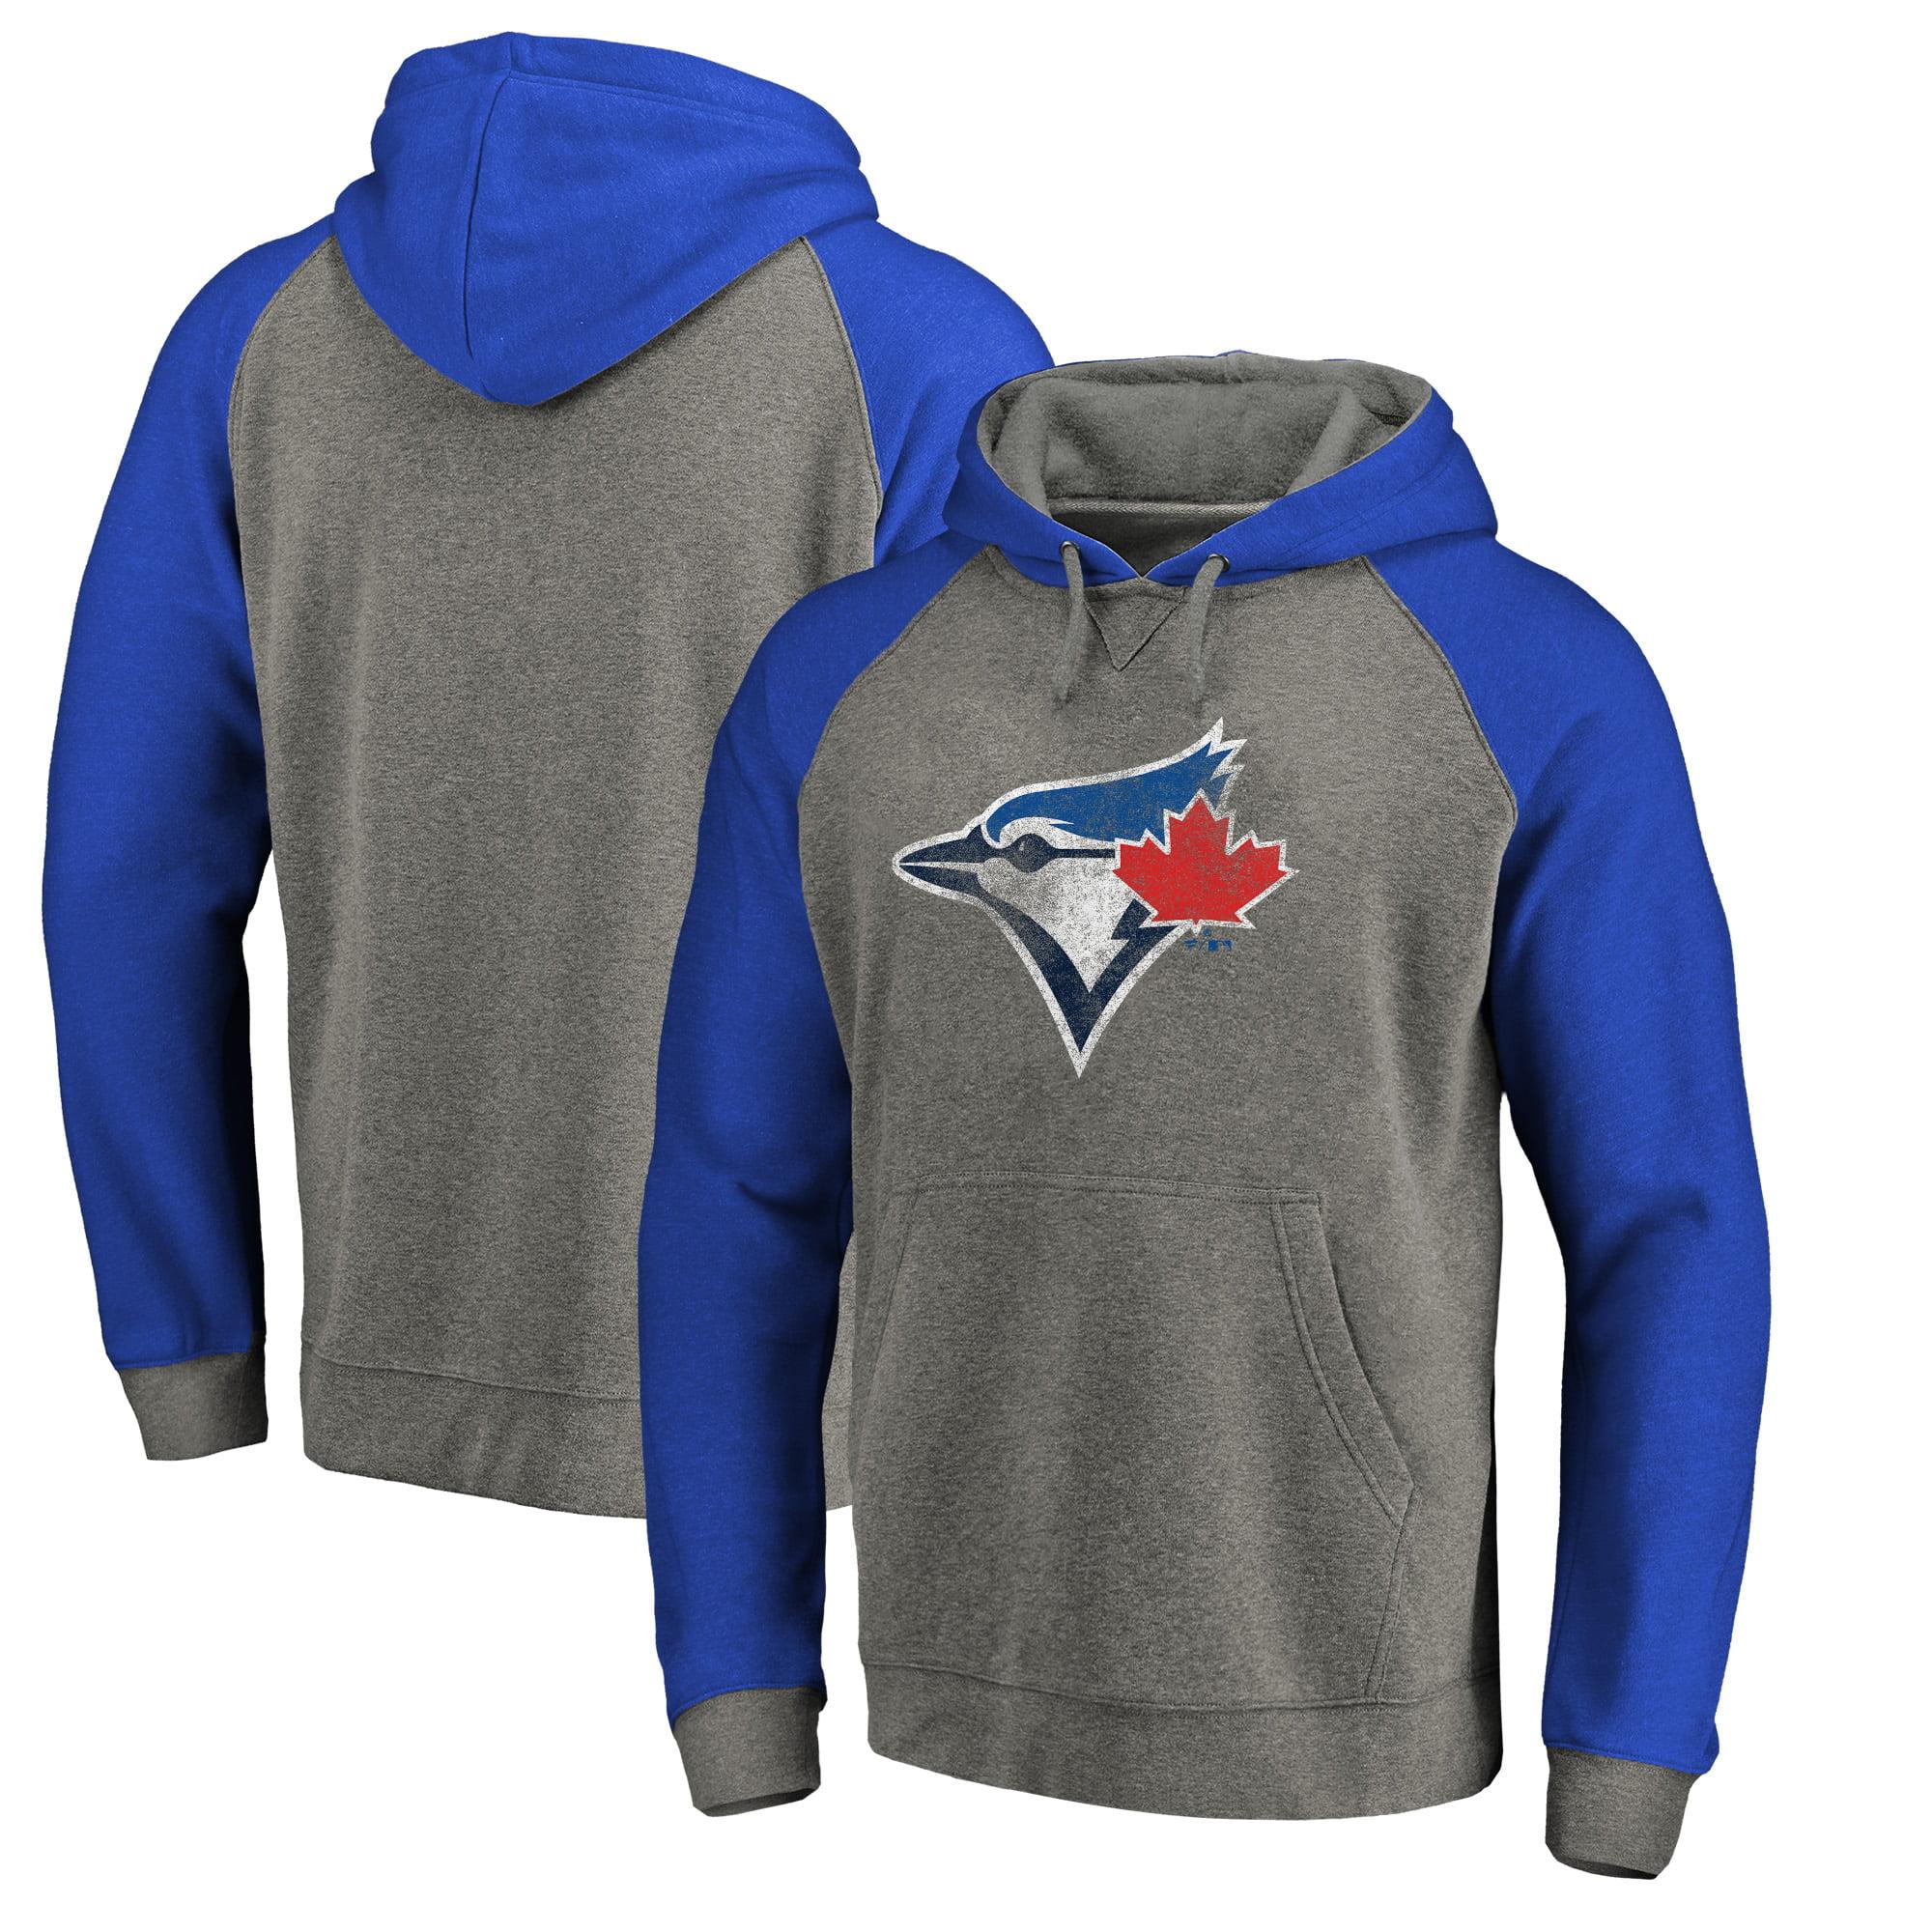 Toronto Blue Jays Fanatics Branded Distressed Team Logo Tri-Blend Big & Tall Raglan Pullover Hoodie - Gray/Royal